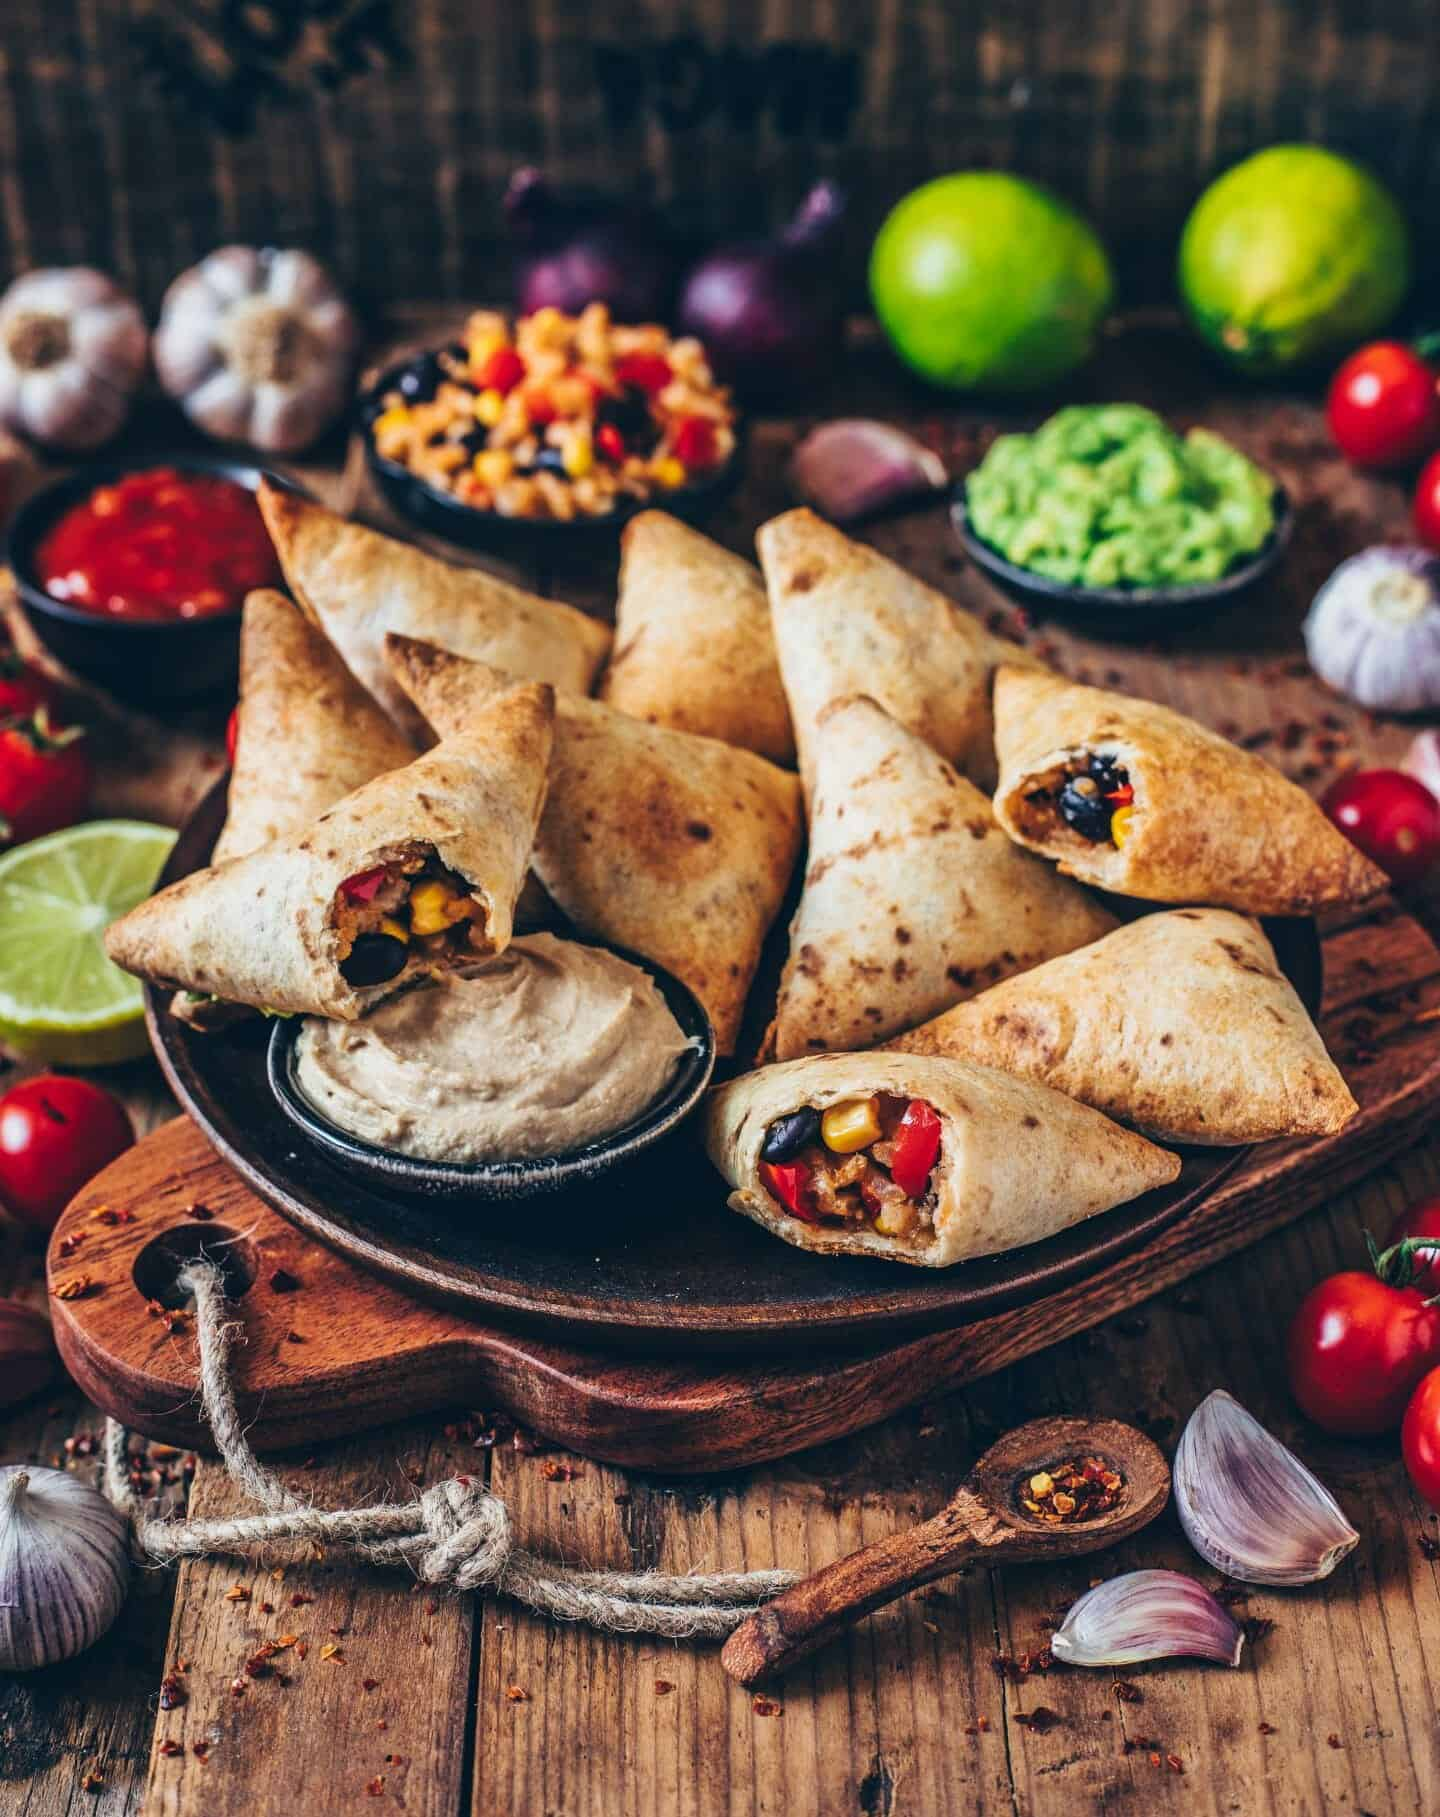 vegan burrito samosas with cashew dip